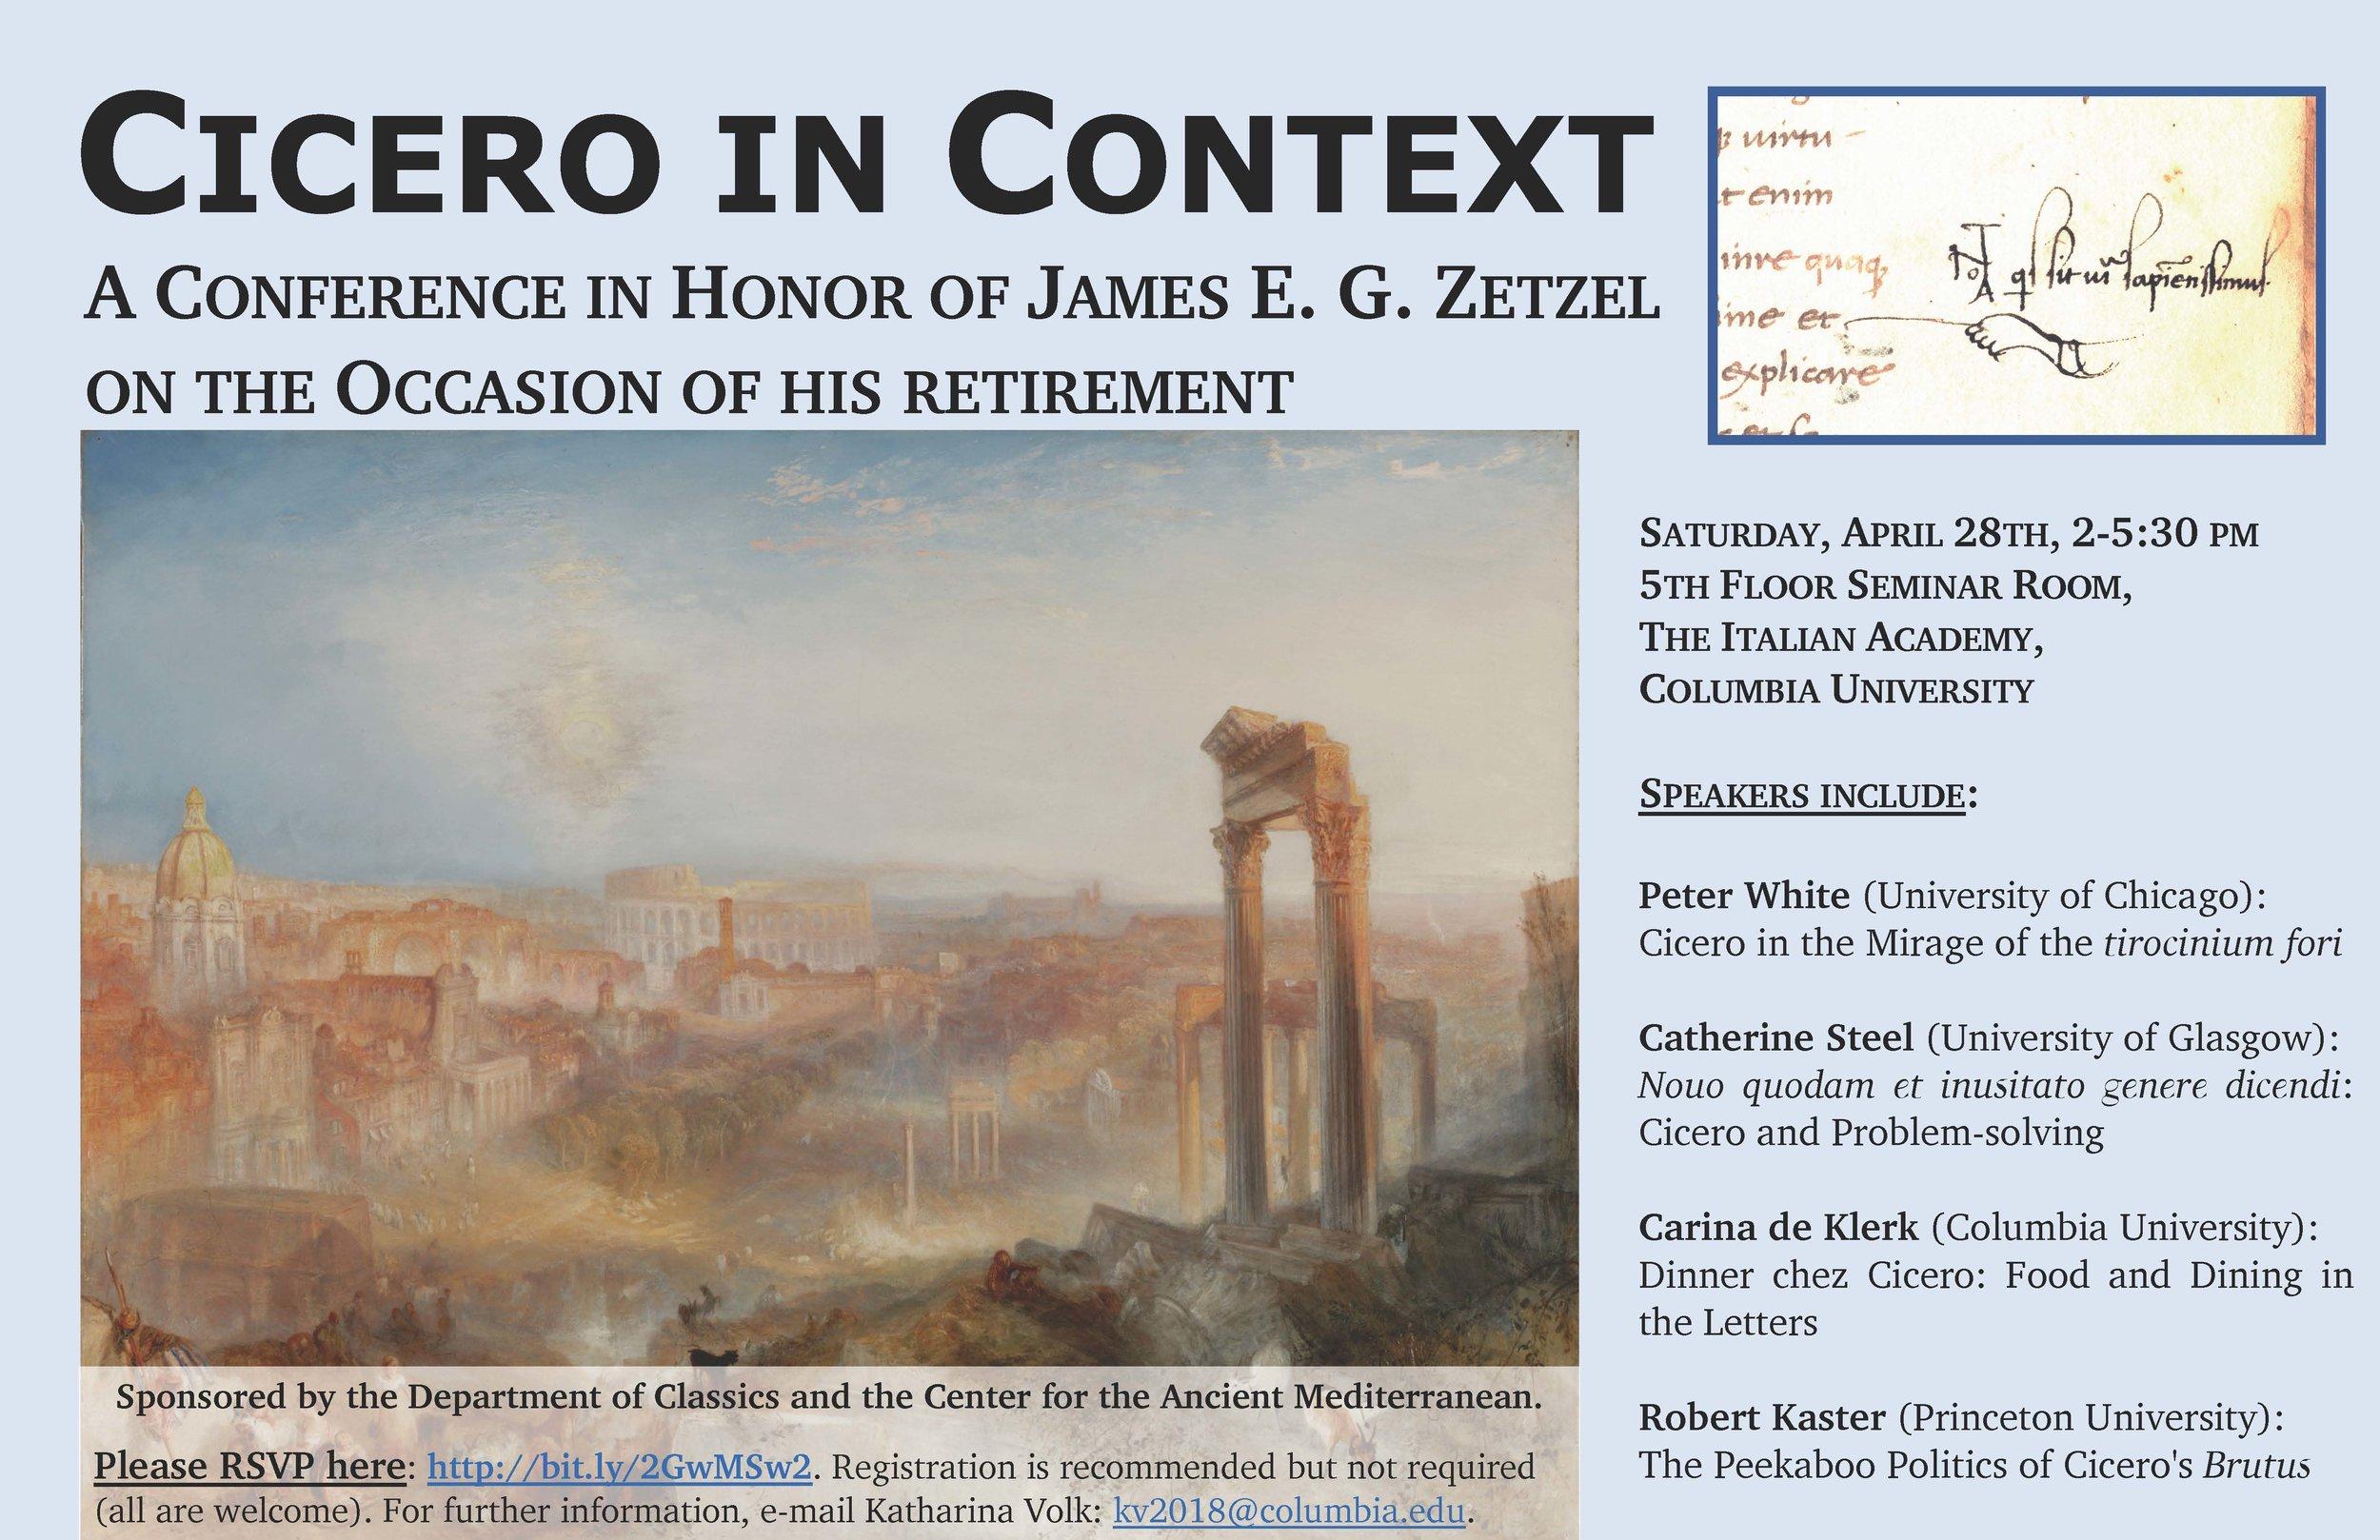 Cicero in Context - James Zetzel Conference.jpg